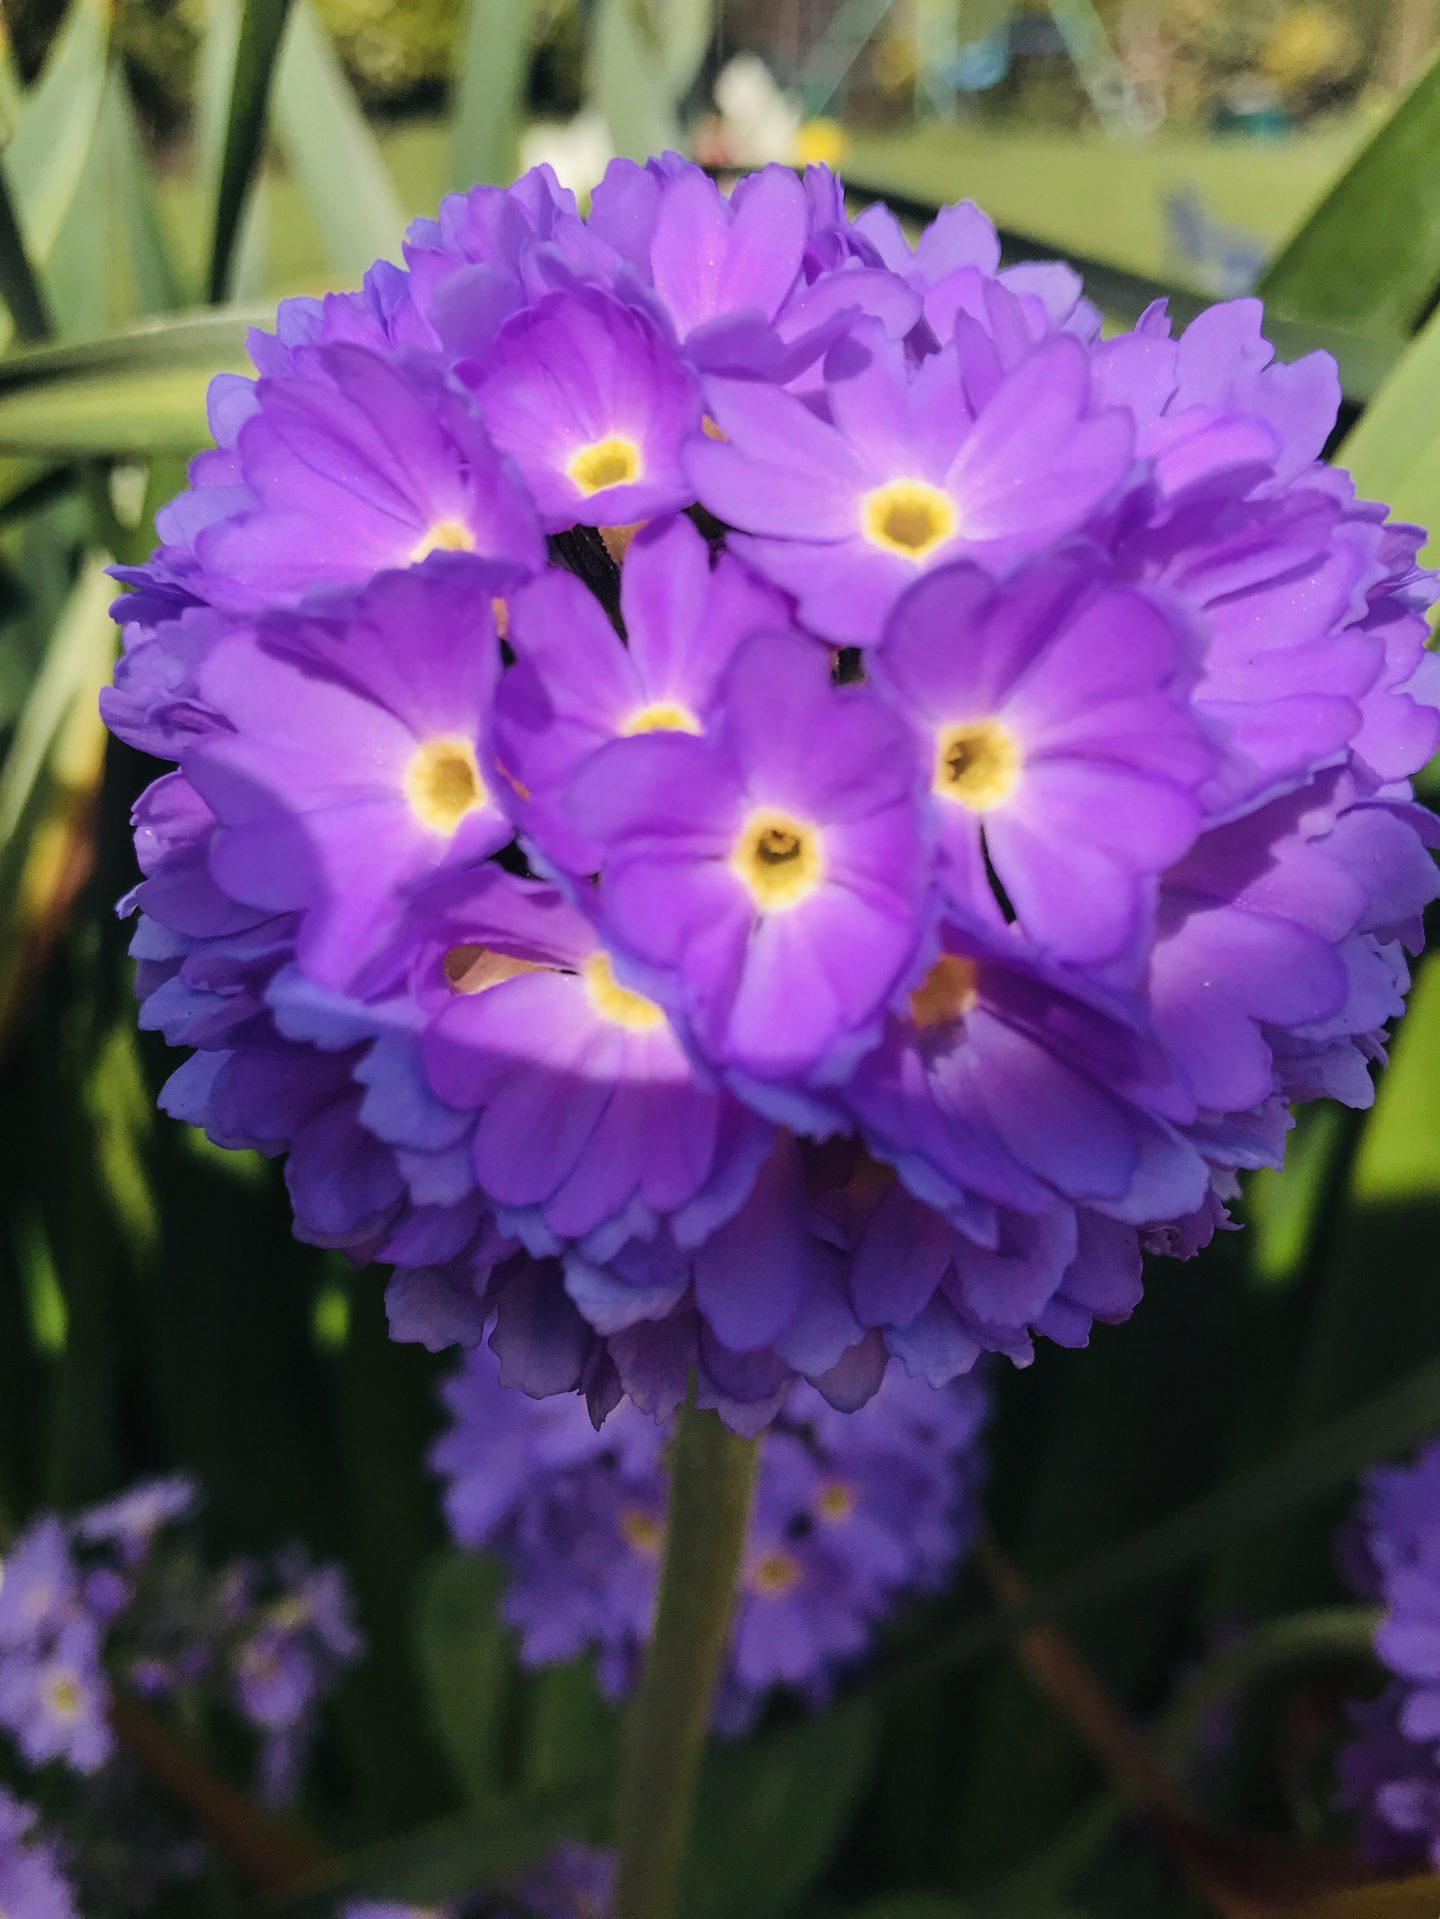 #MySundaySnapshot – Spring Is In Bloom 14/52 (2019)